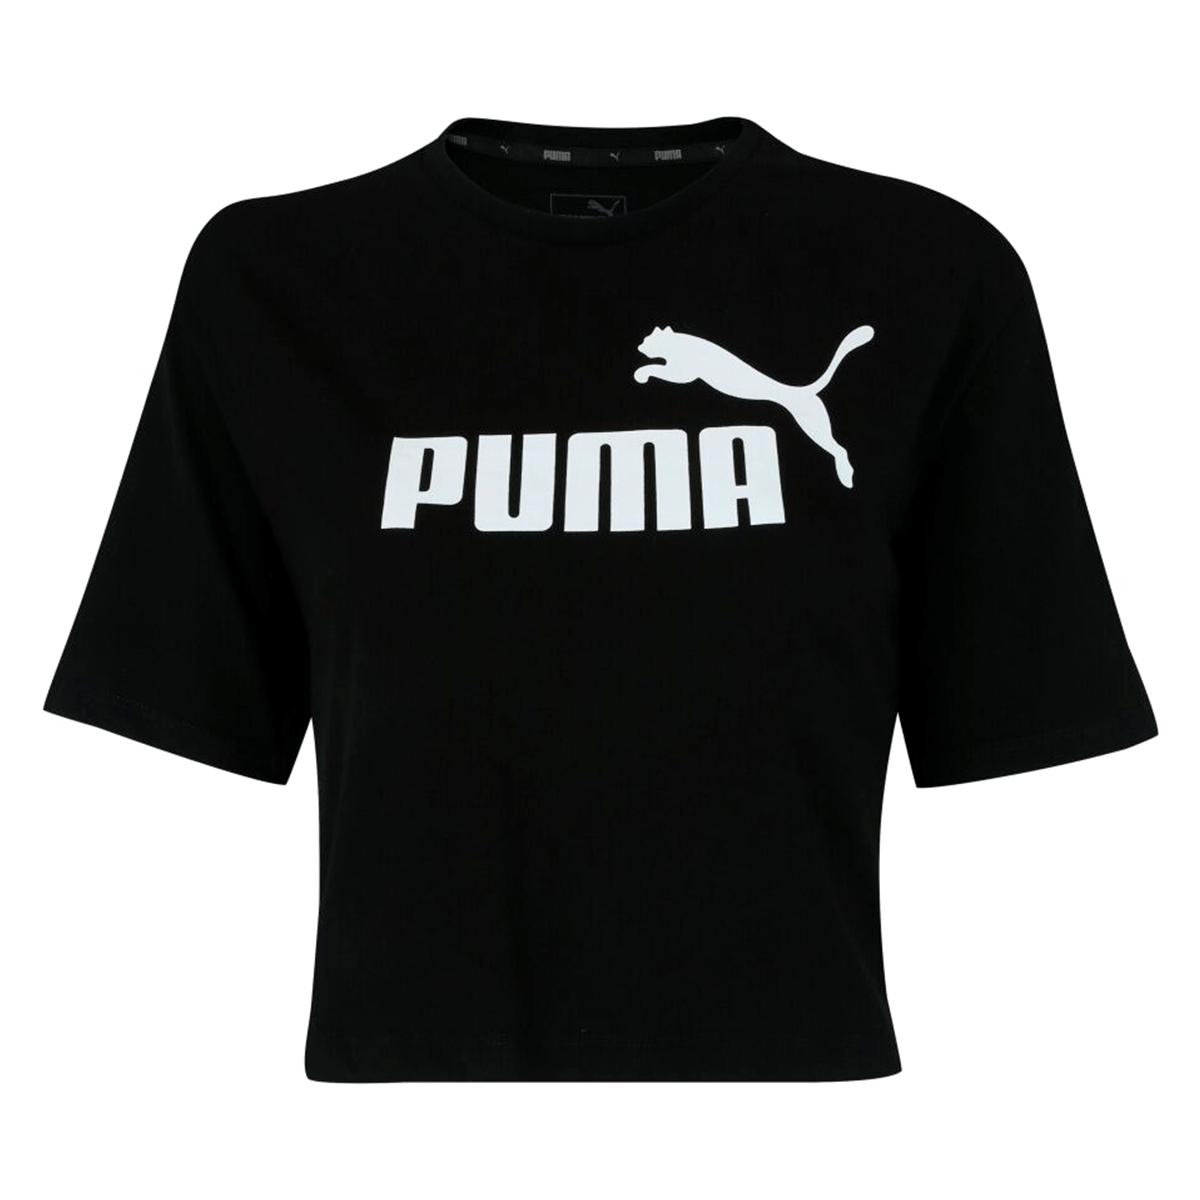 Blusa Cropped Puma Elevated Essentials Tee Feminino